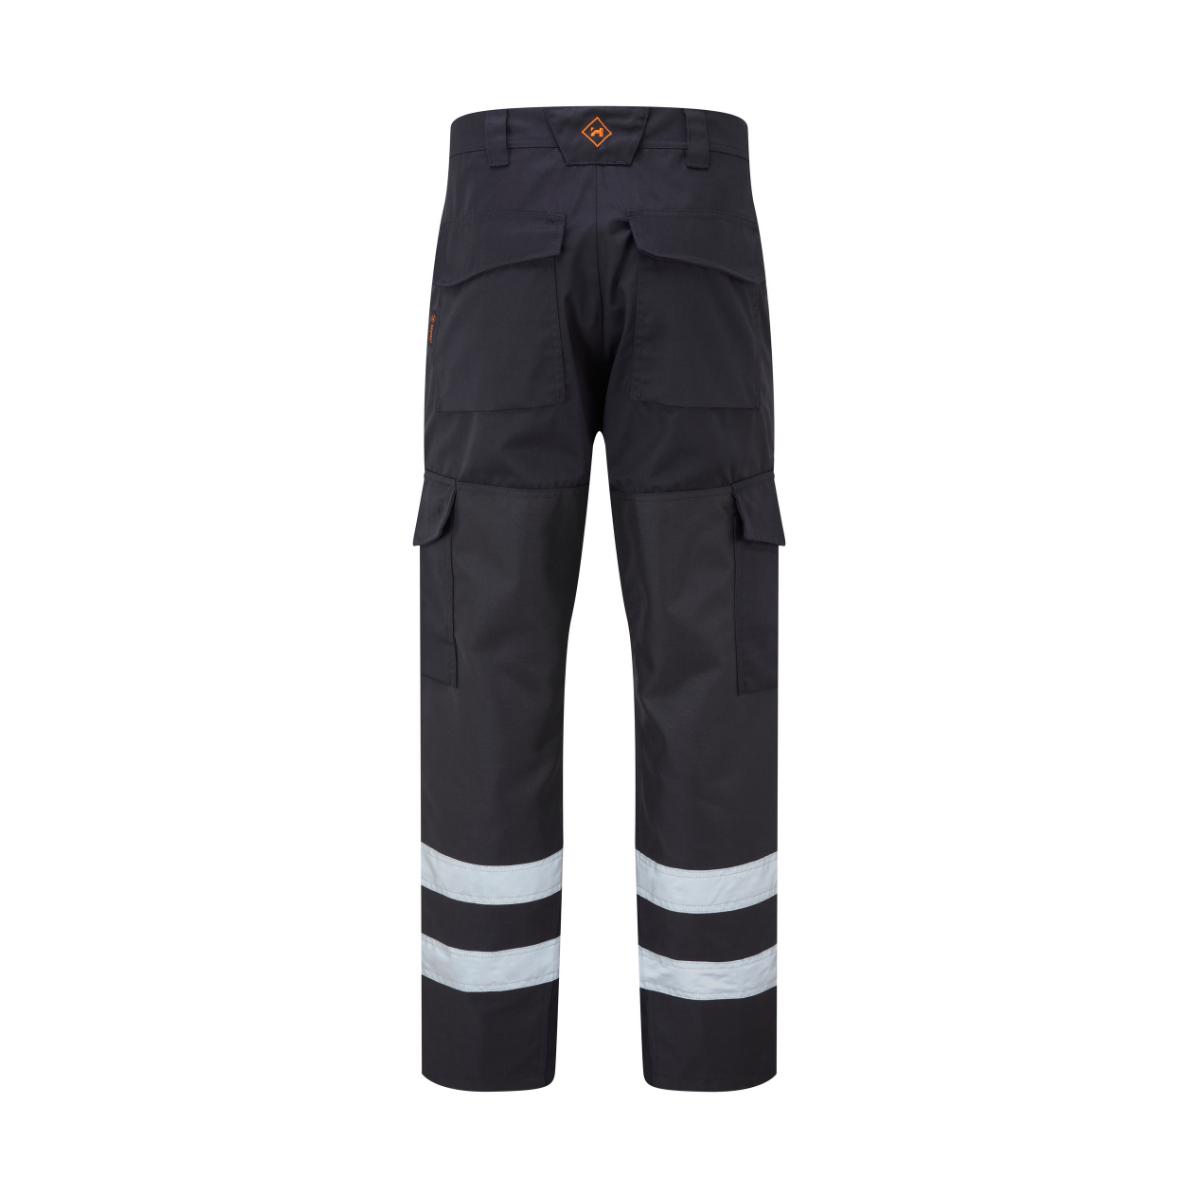 TR1848_HAZTEC® Tempa 80% Ballistic Trouser - Navy_Back